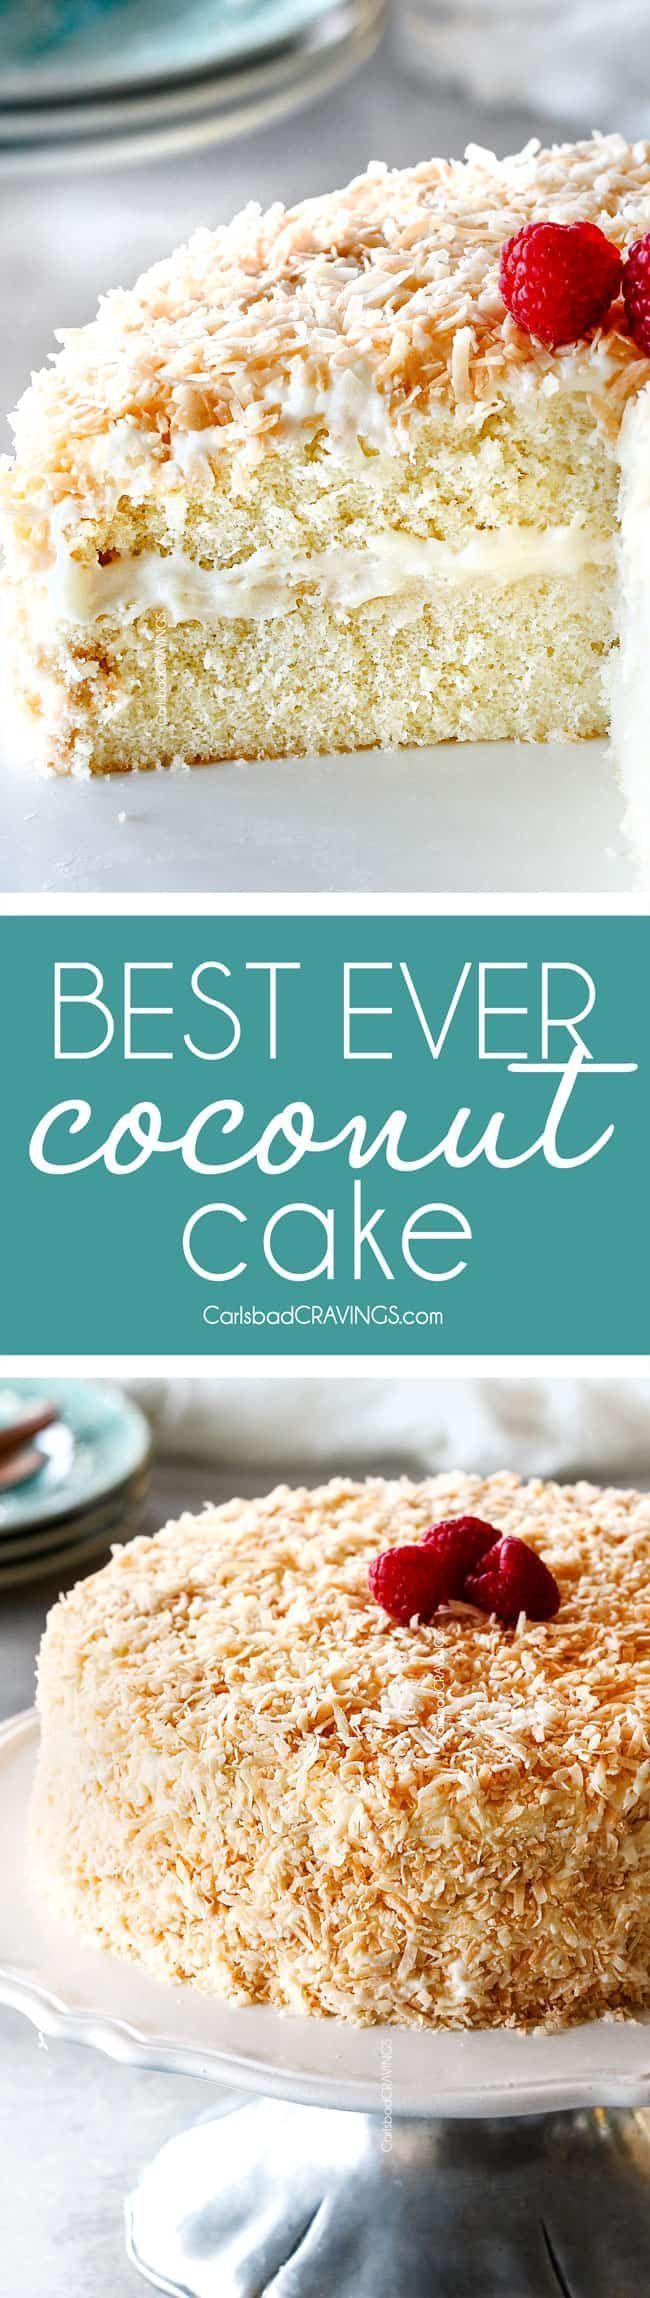 936 best RECIPES Cakes Cupcakes images on Pinterest Dessert